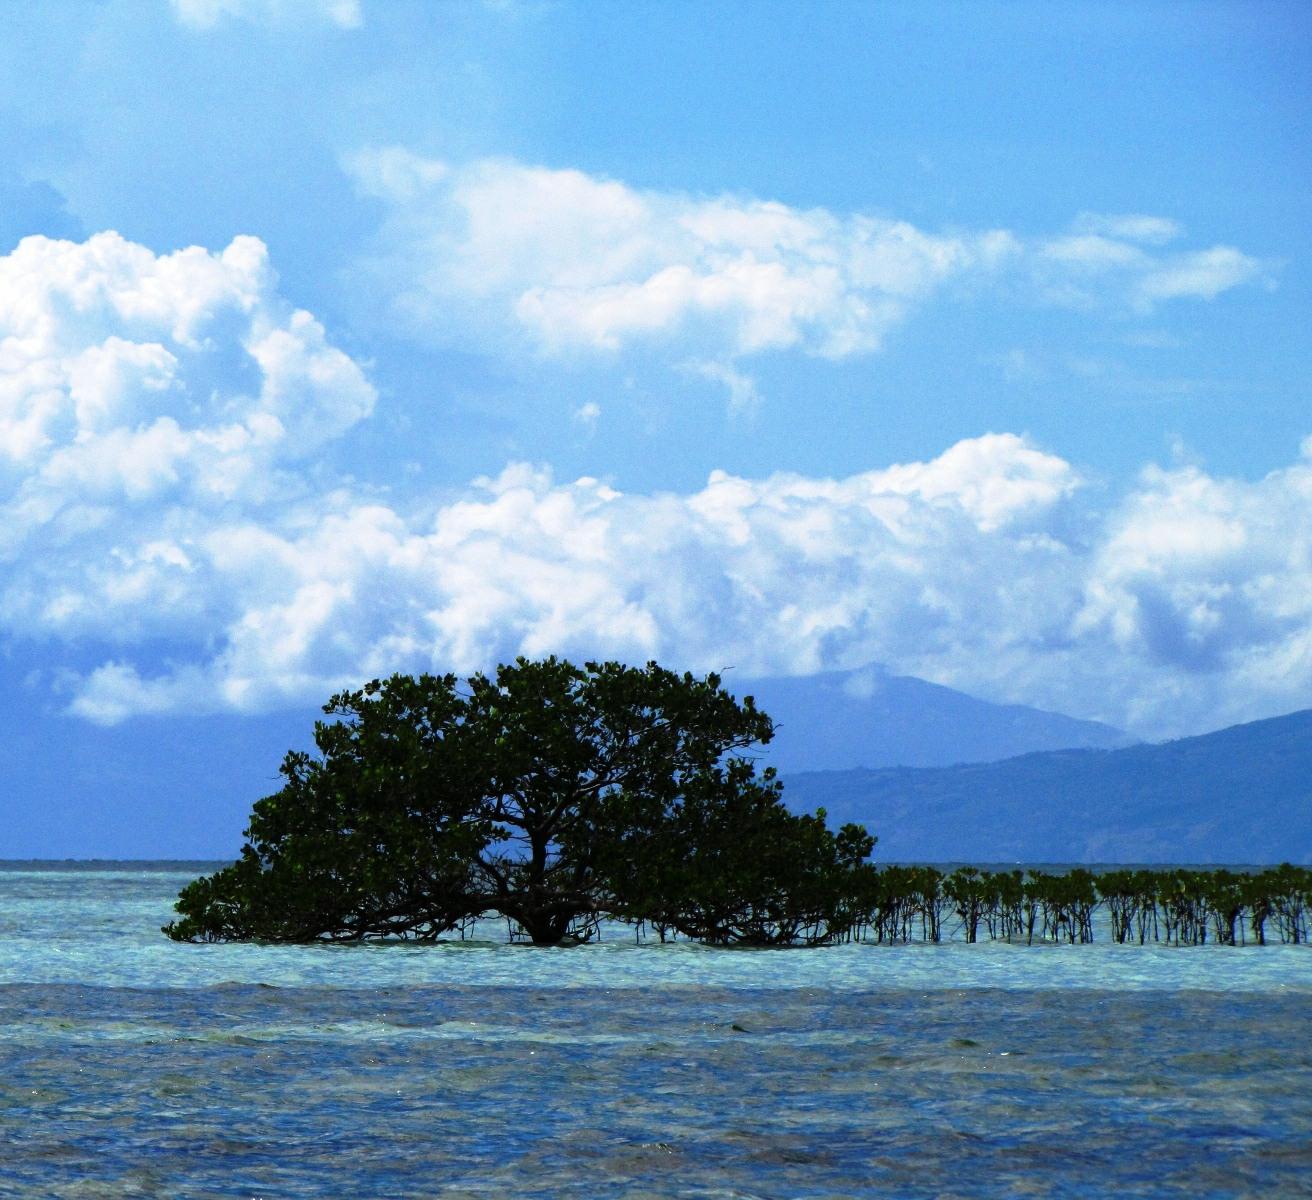 IMG_9218-Panglao-Island-hopping-2012-01-30-crop-600pxw-224x192